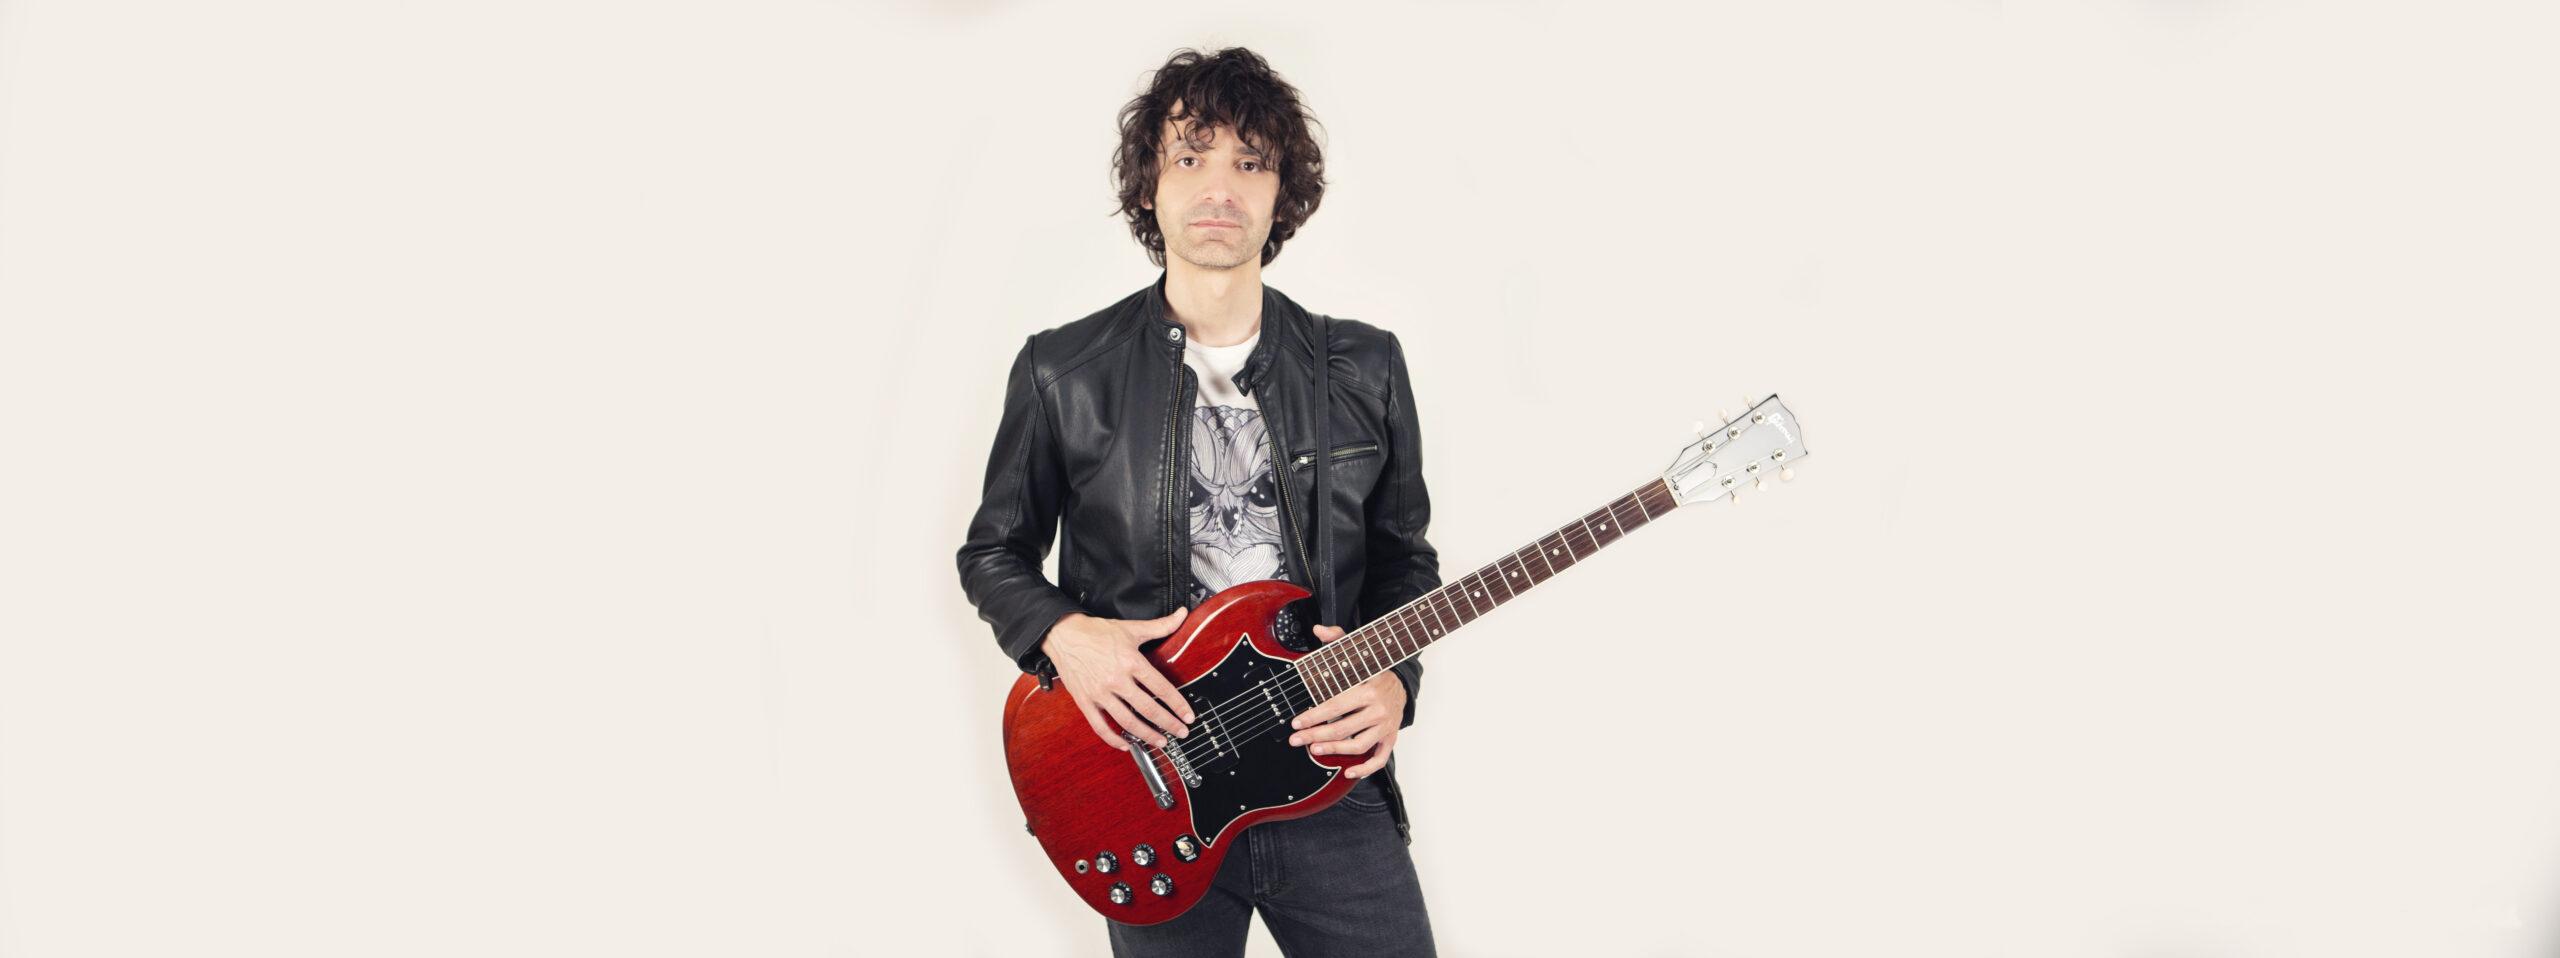 Francesco Garolfi - Gibson SG - Biografia